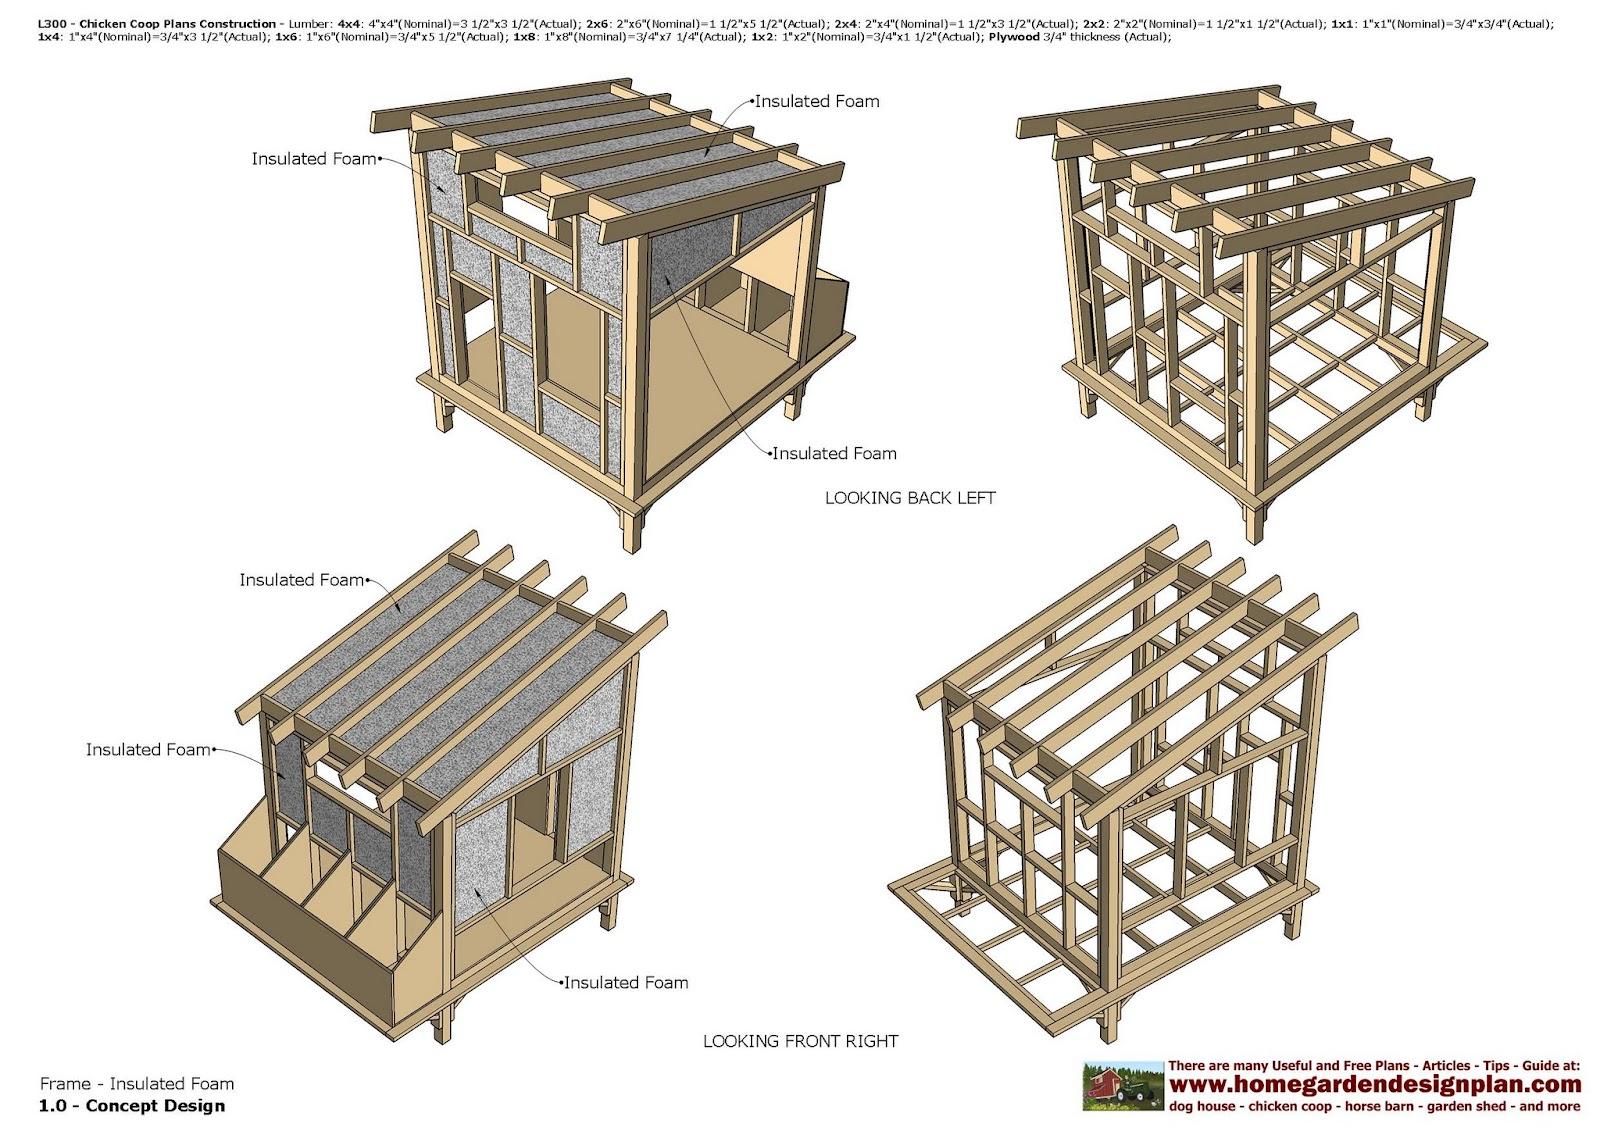 home garden plans: L300 - Chicken Coop Plans Construction ...